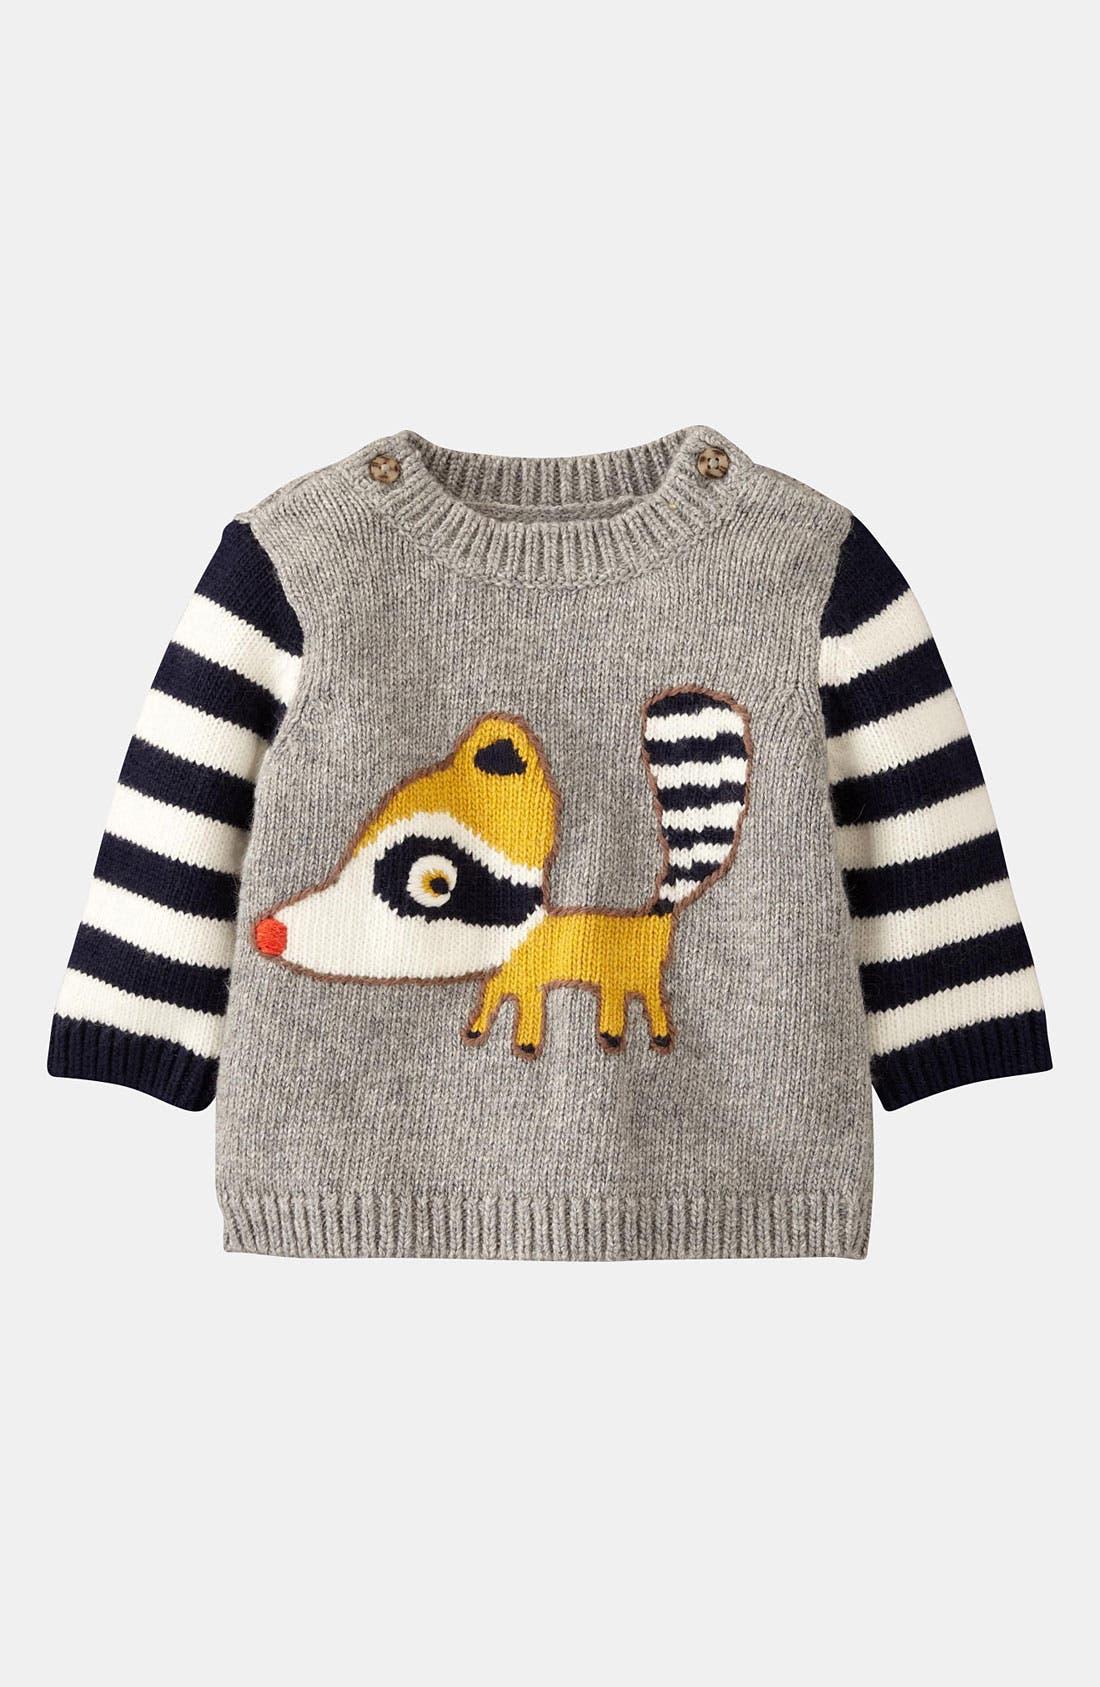 Alternate Image 1 Selected - Mini Boden 'Logo' Sweater (Infant)